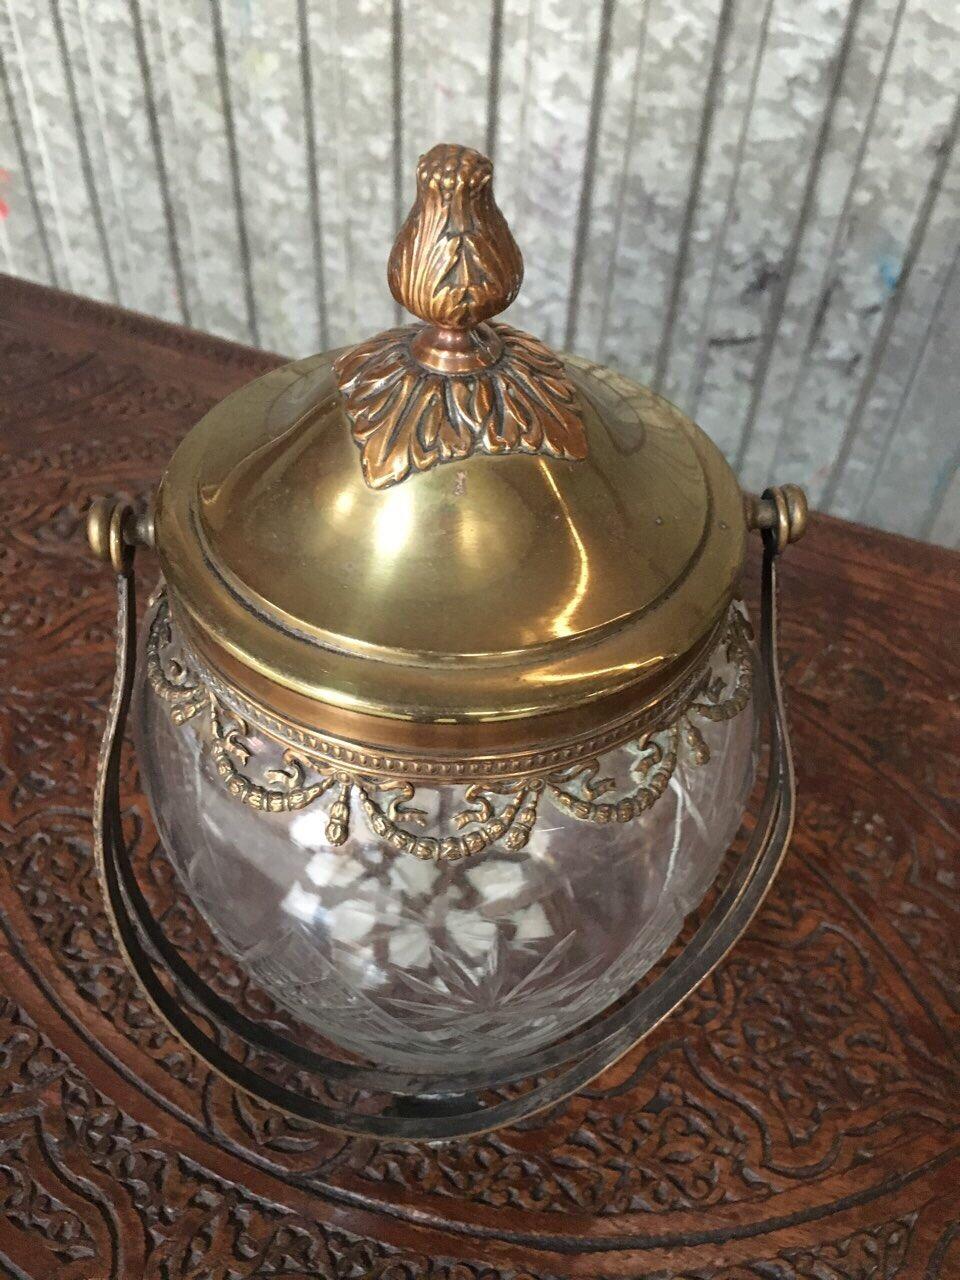 Антикварная хрустальная бисквитница с латунным орнаментом 190223001